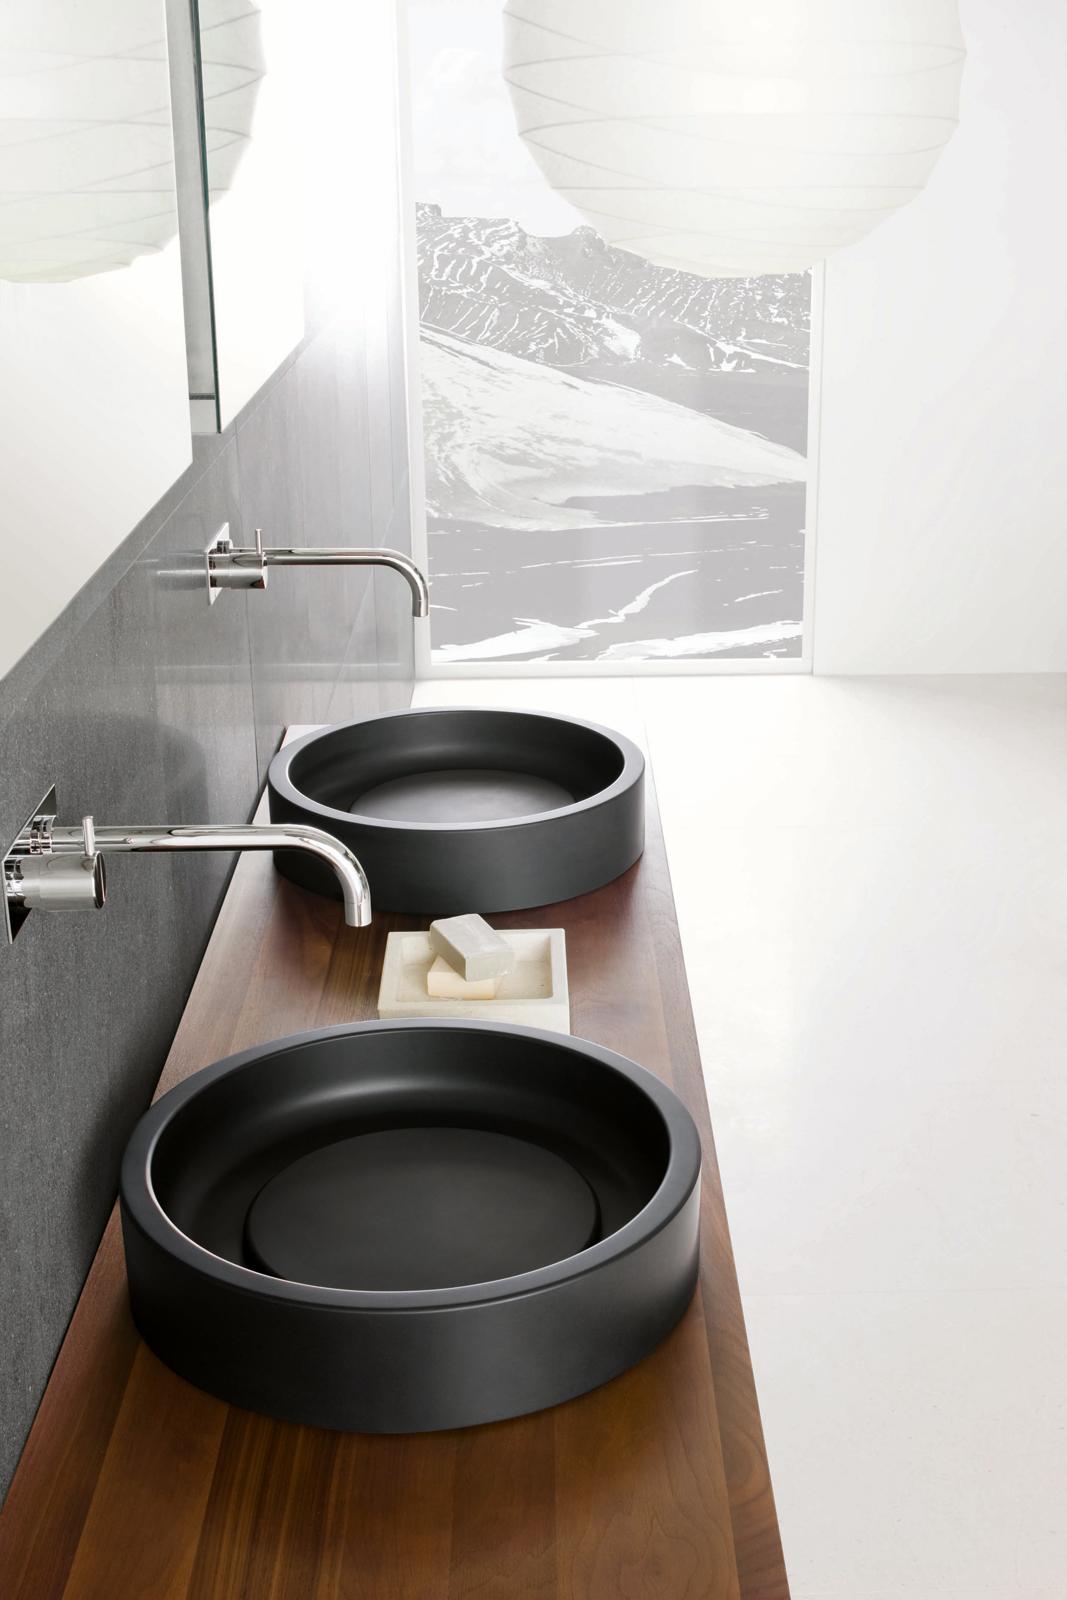 Detail shot of the Inkstone wash-basins in Black Rock stone.